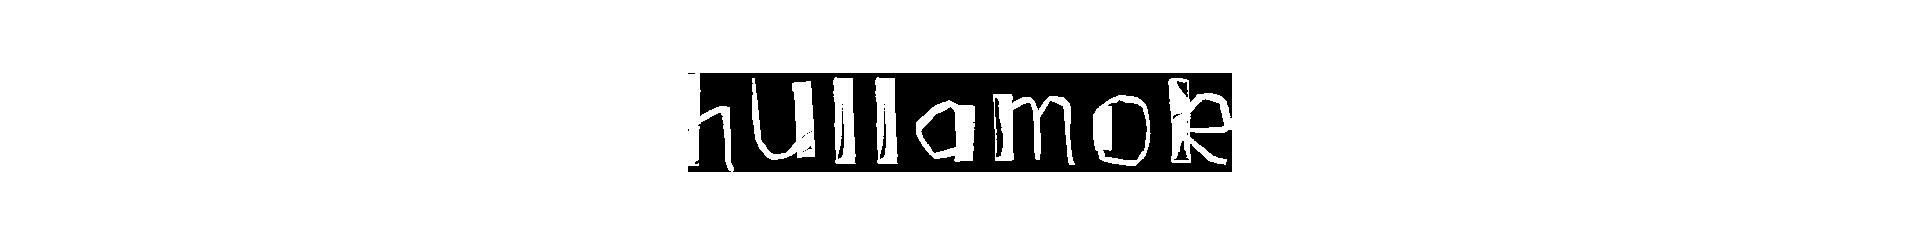 hullamok